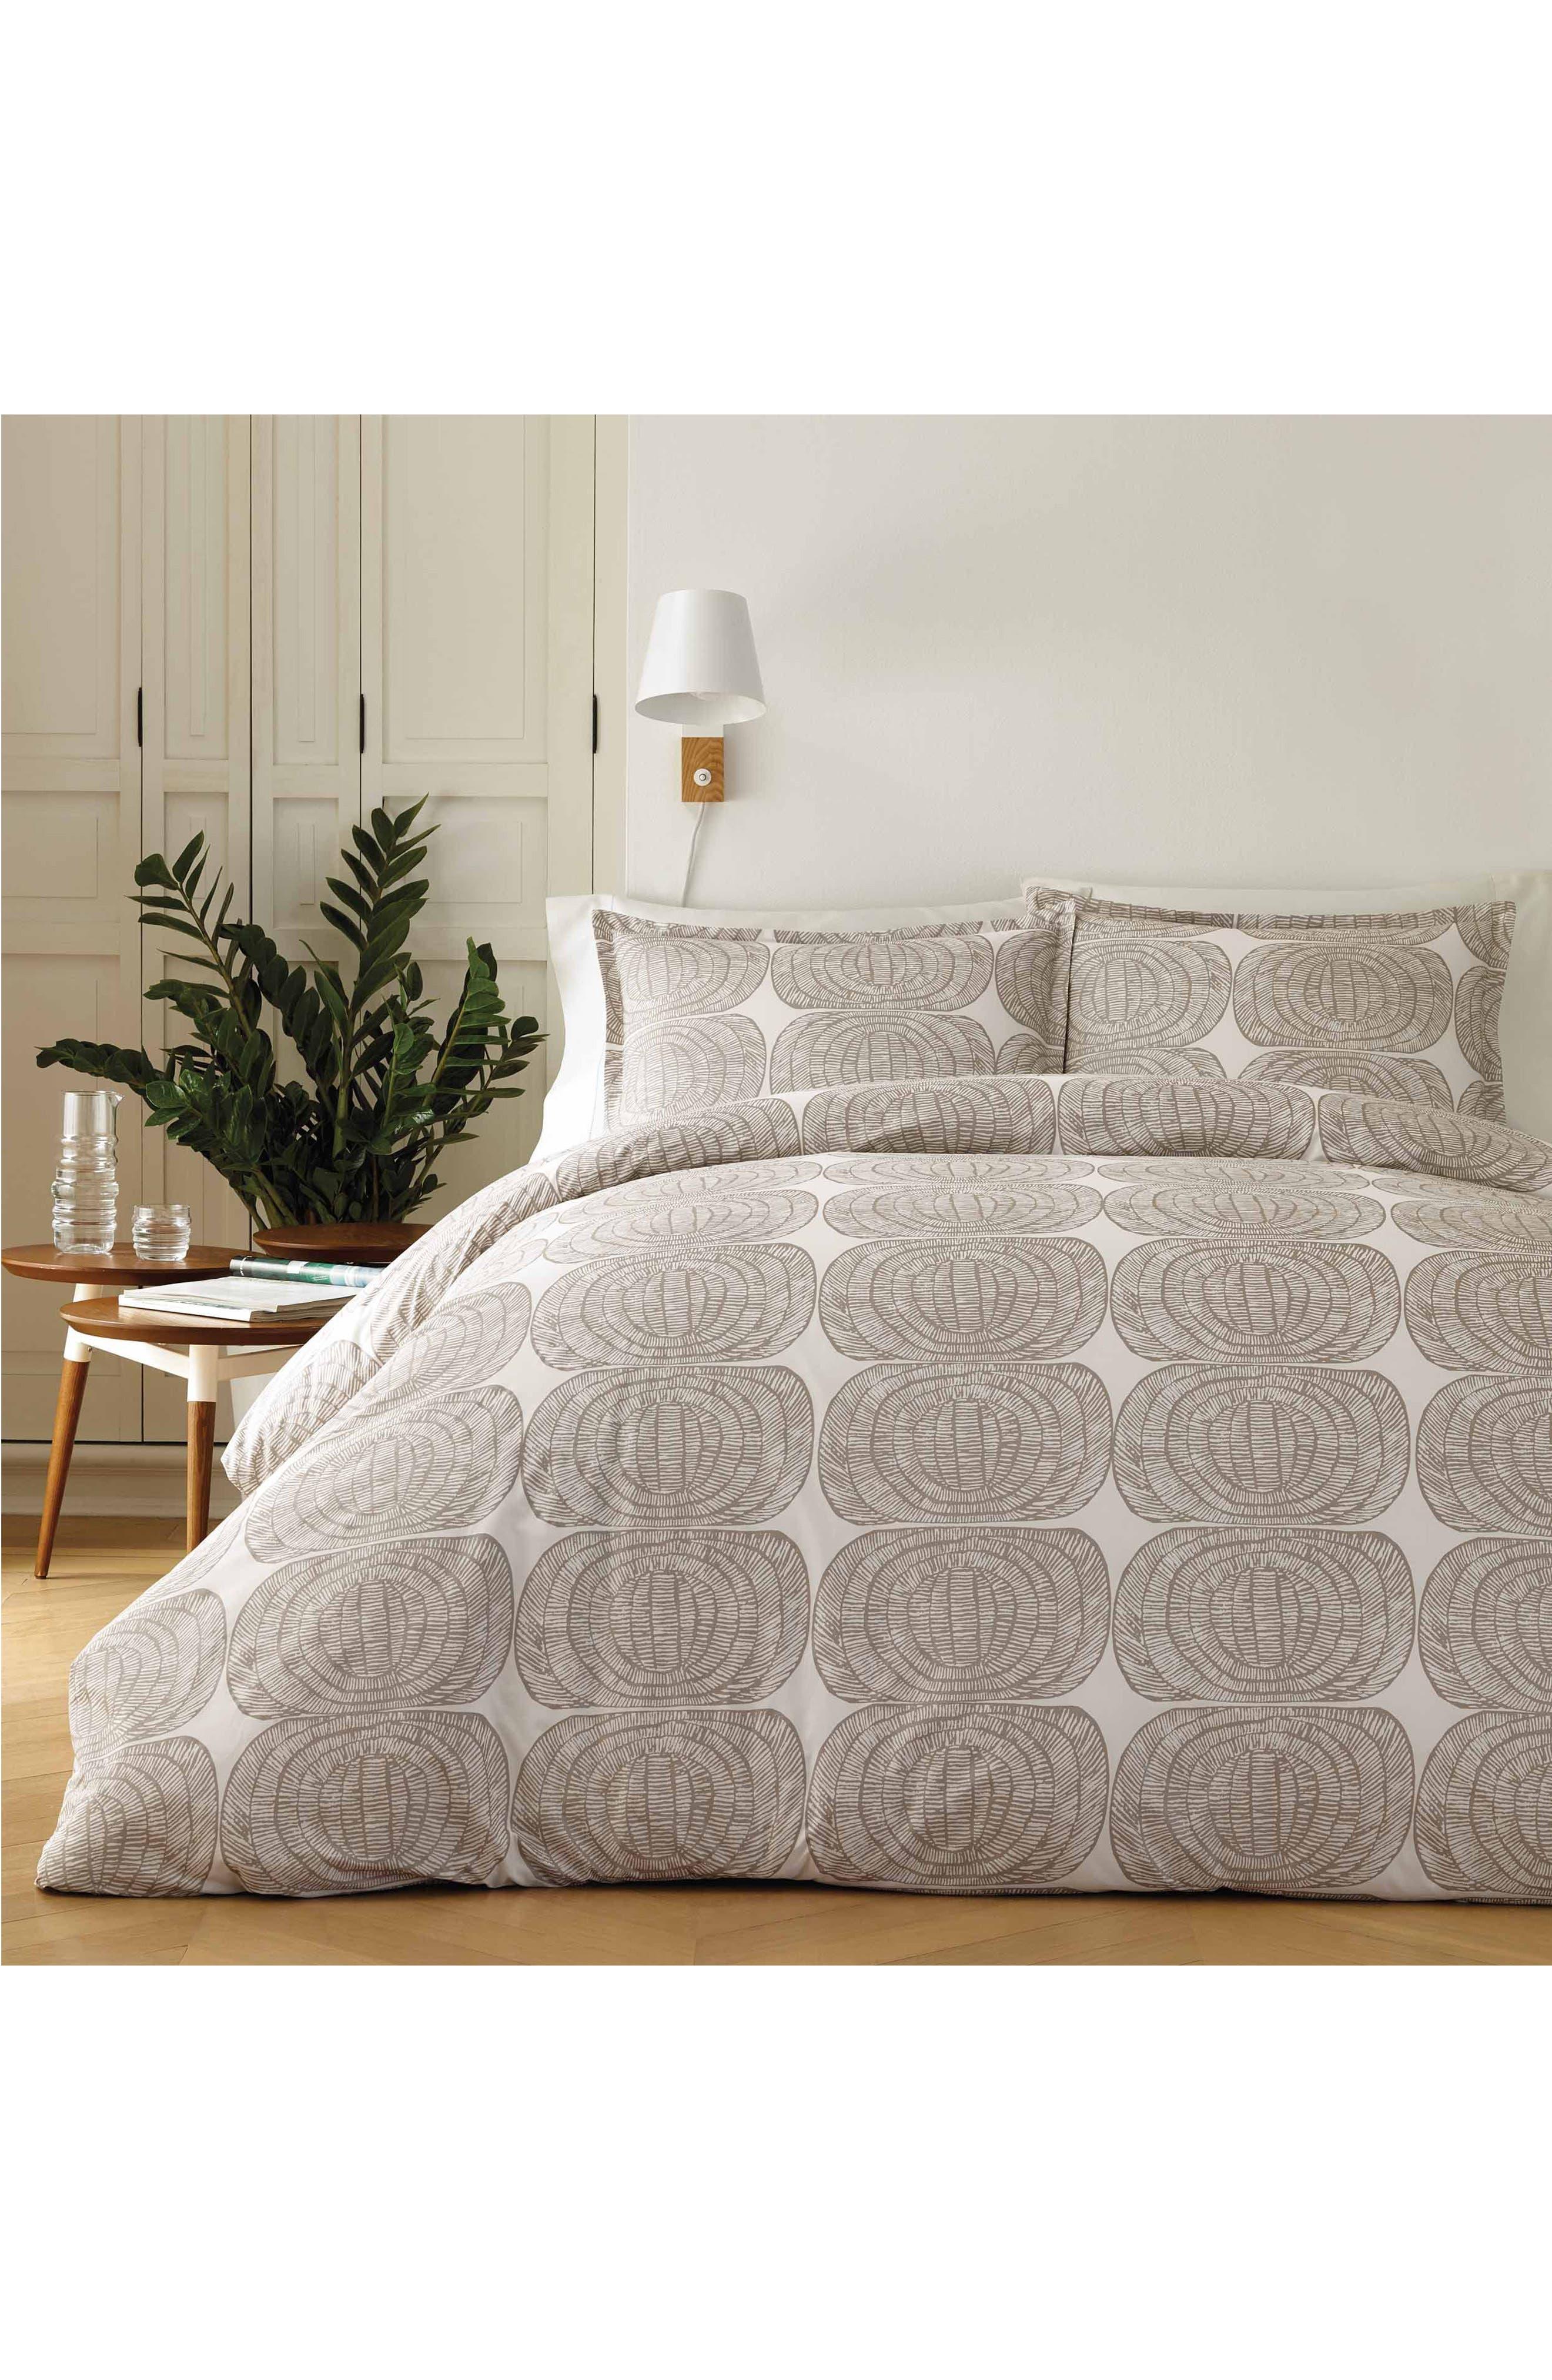 marimekko mehilispes comforter u0026 sham set - Marimekko Bedding